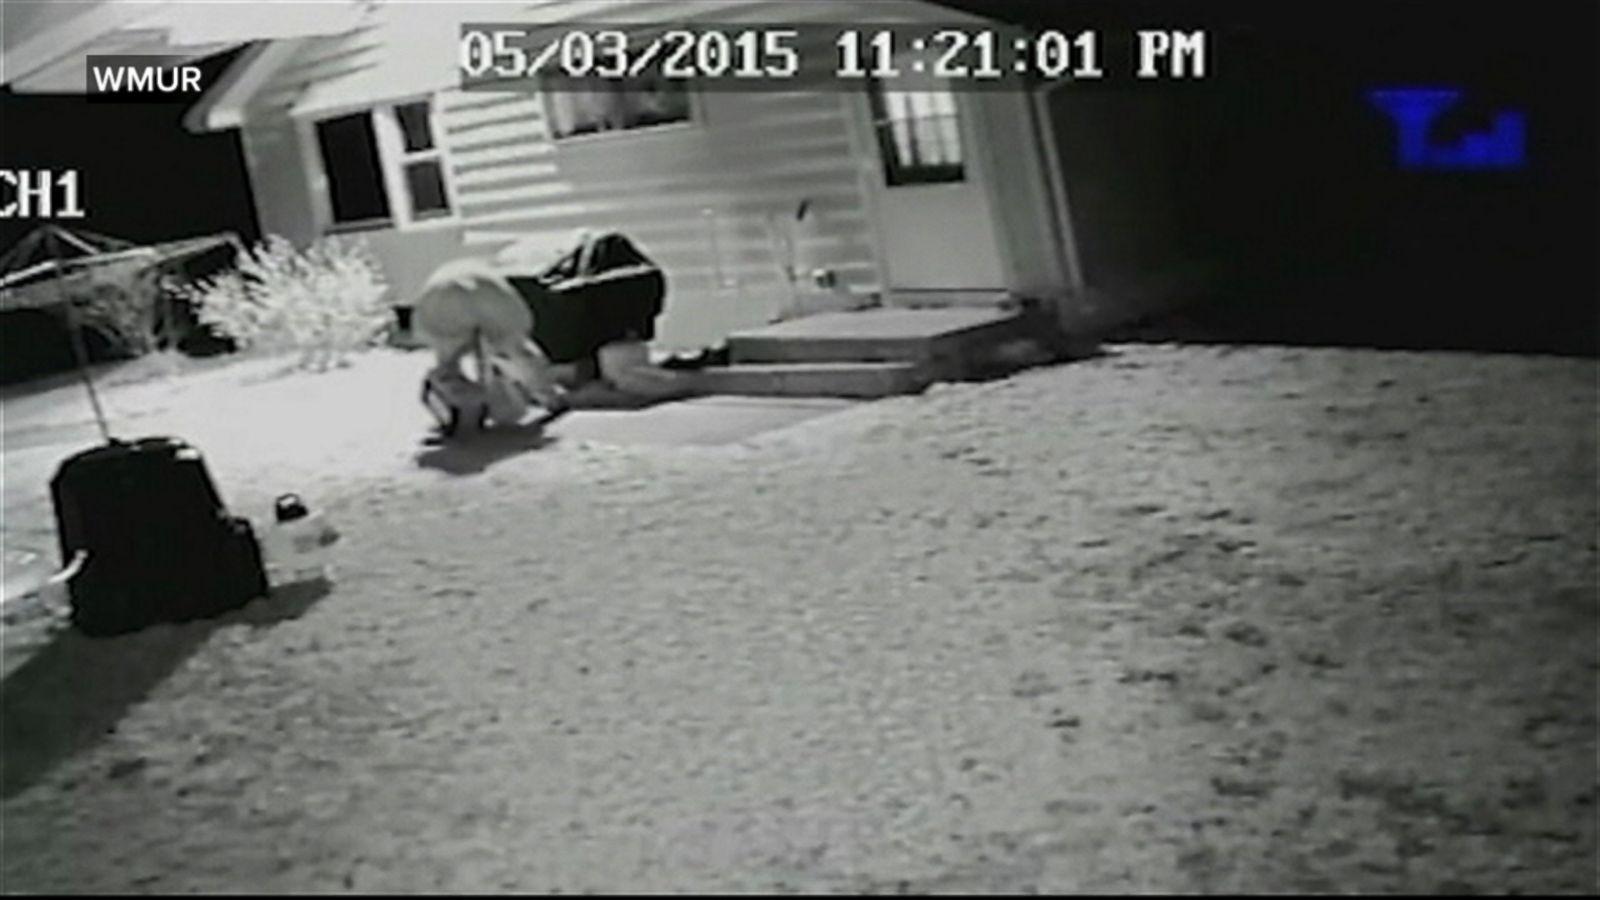 New Hampshire Home Invaders Caught on Camera Ambushing Woman - ABC News